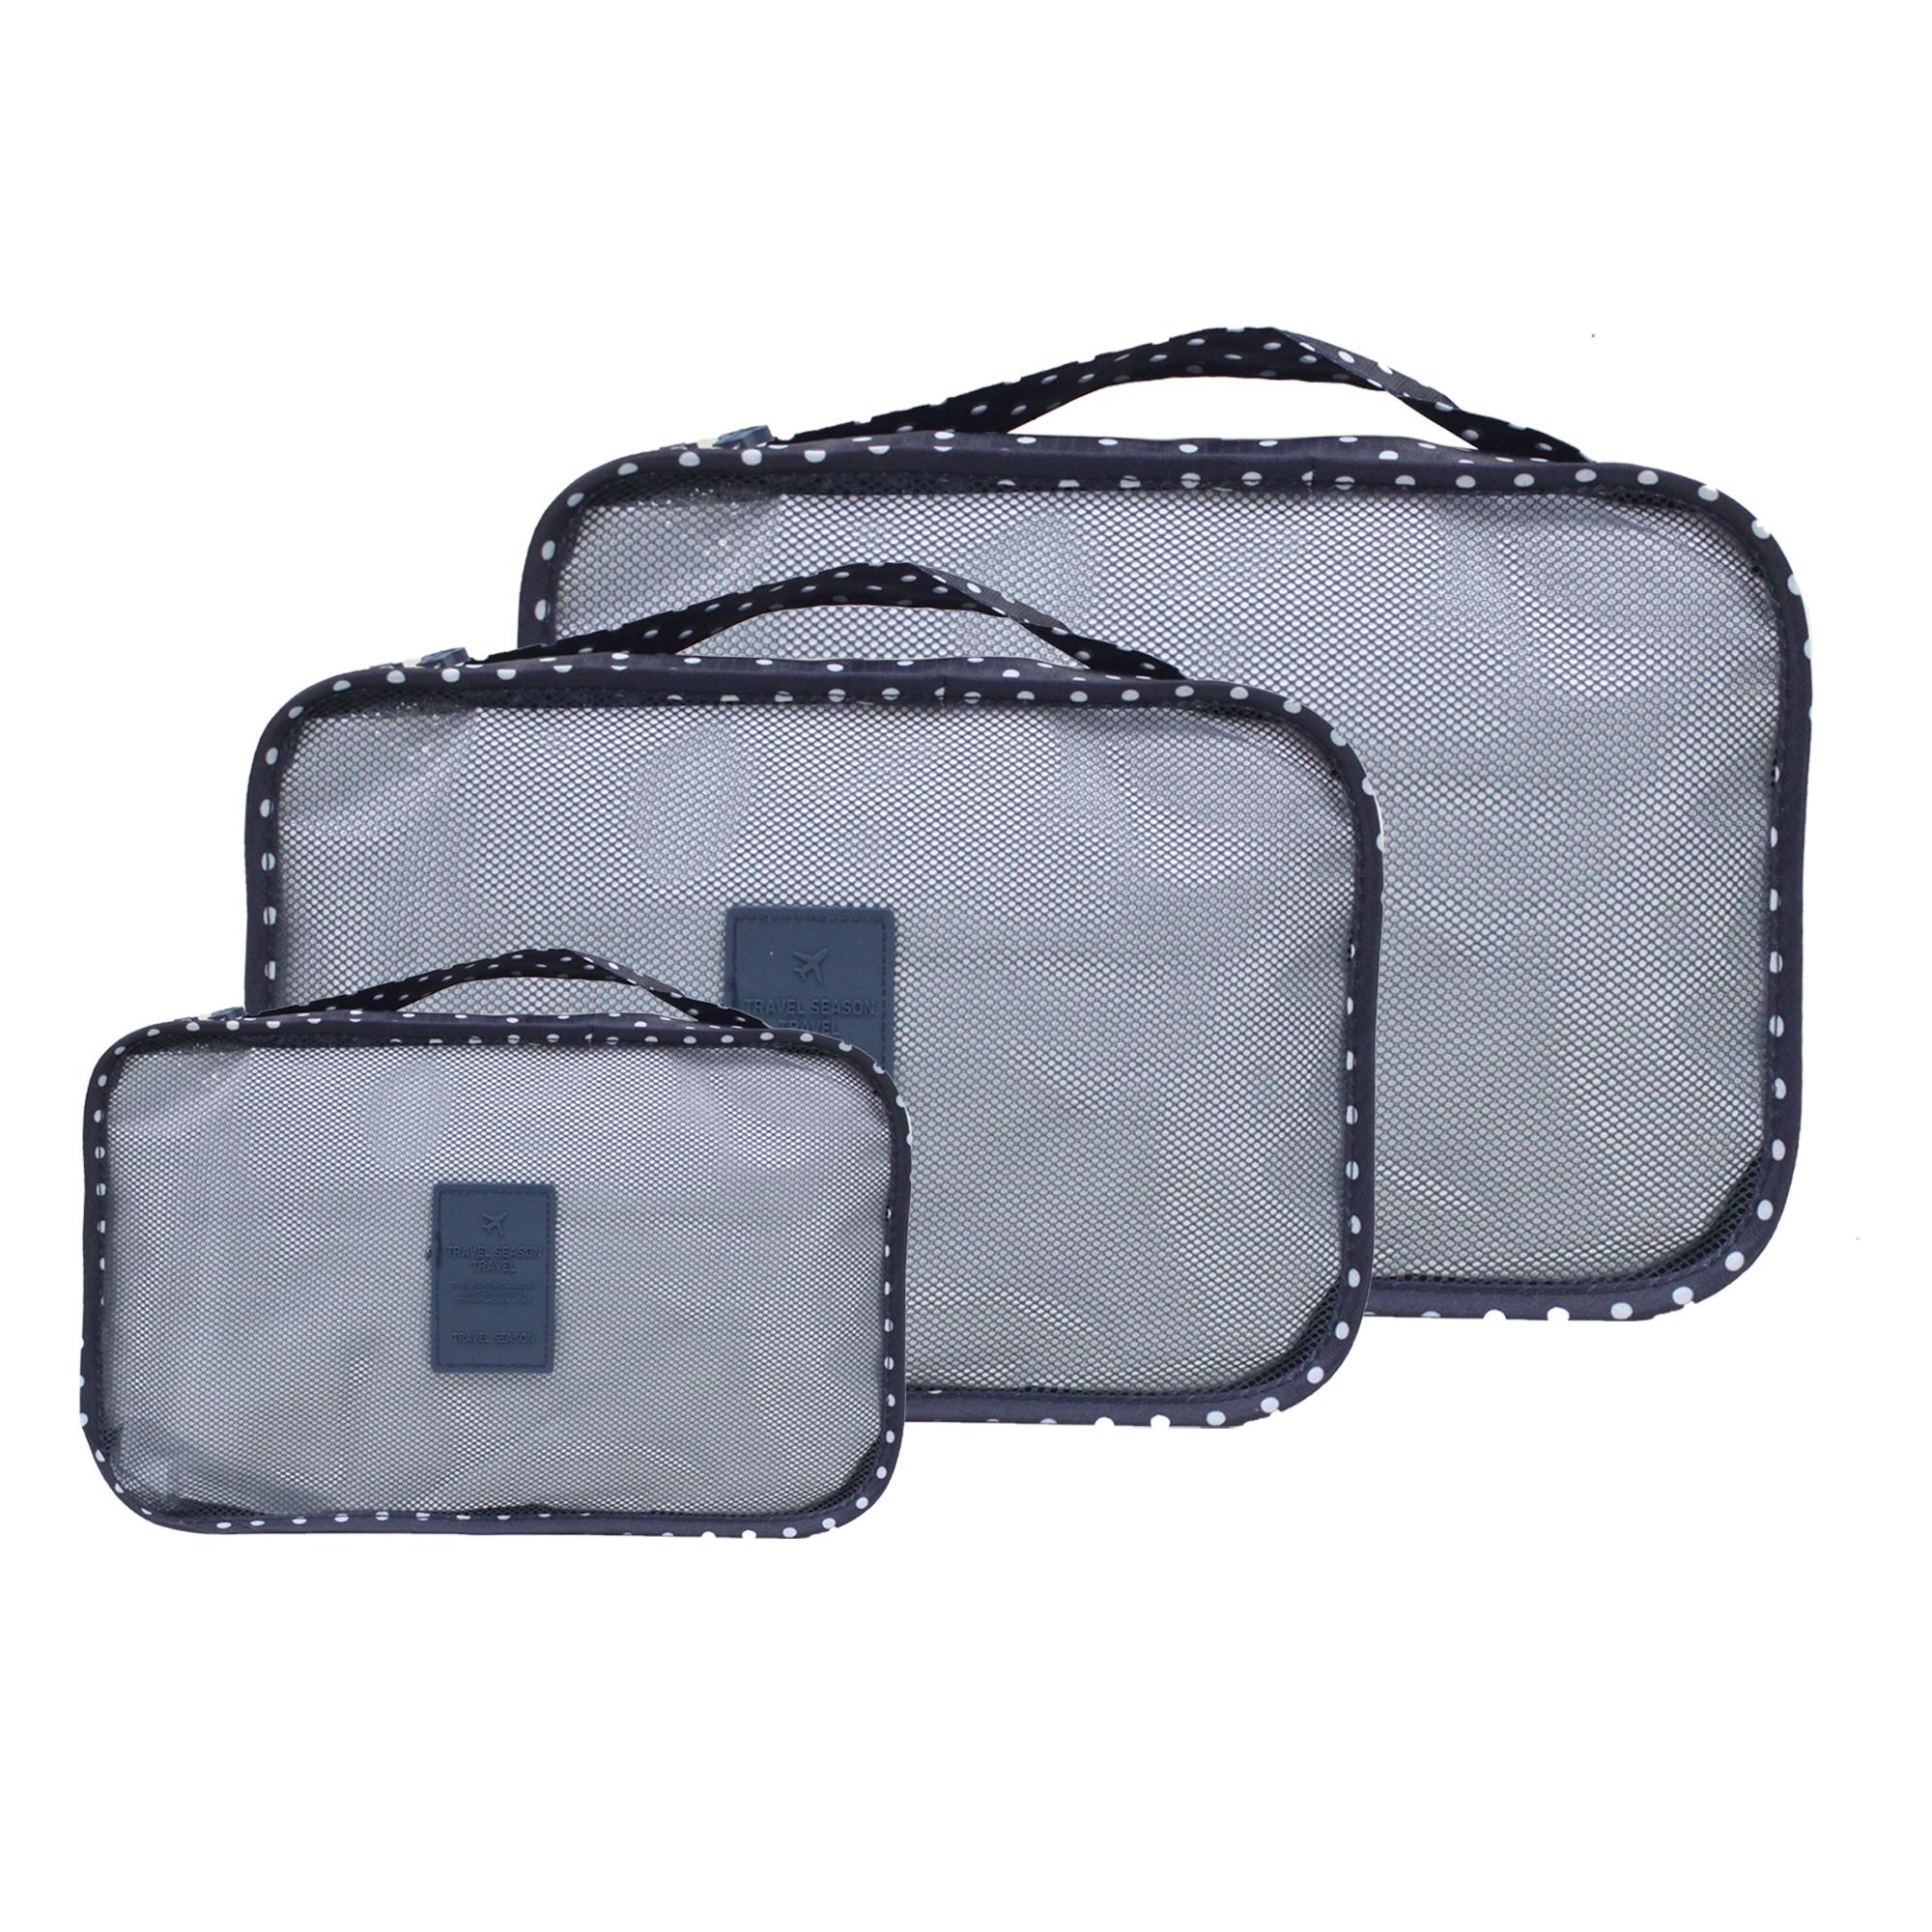 6 in 1 Packing Bags (Polka Navy blue)